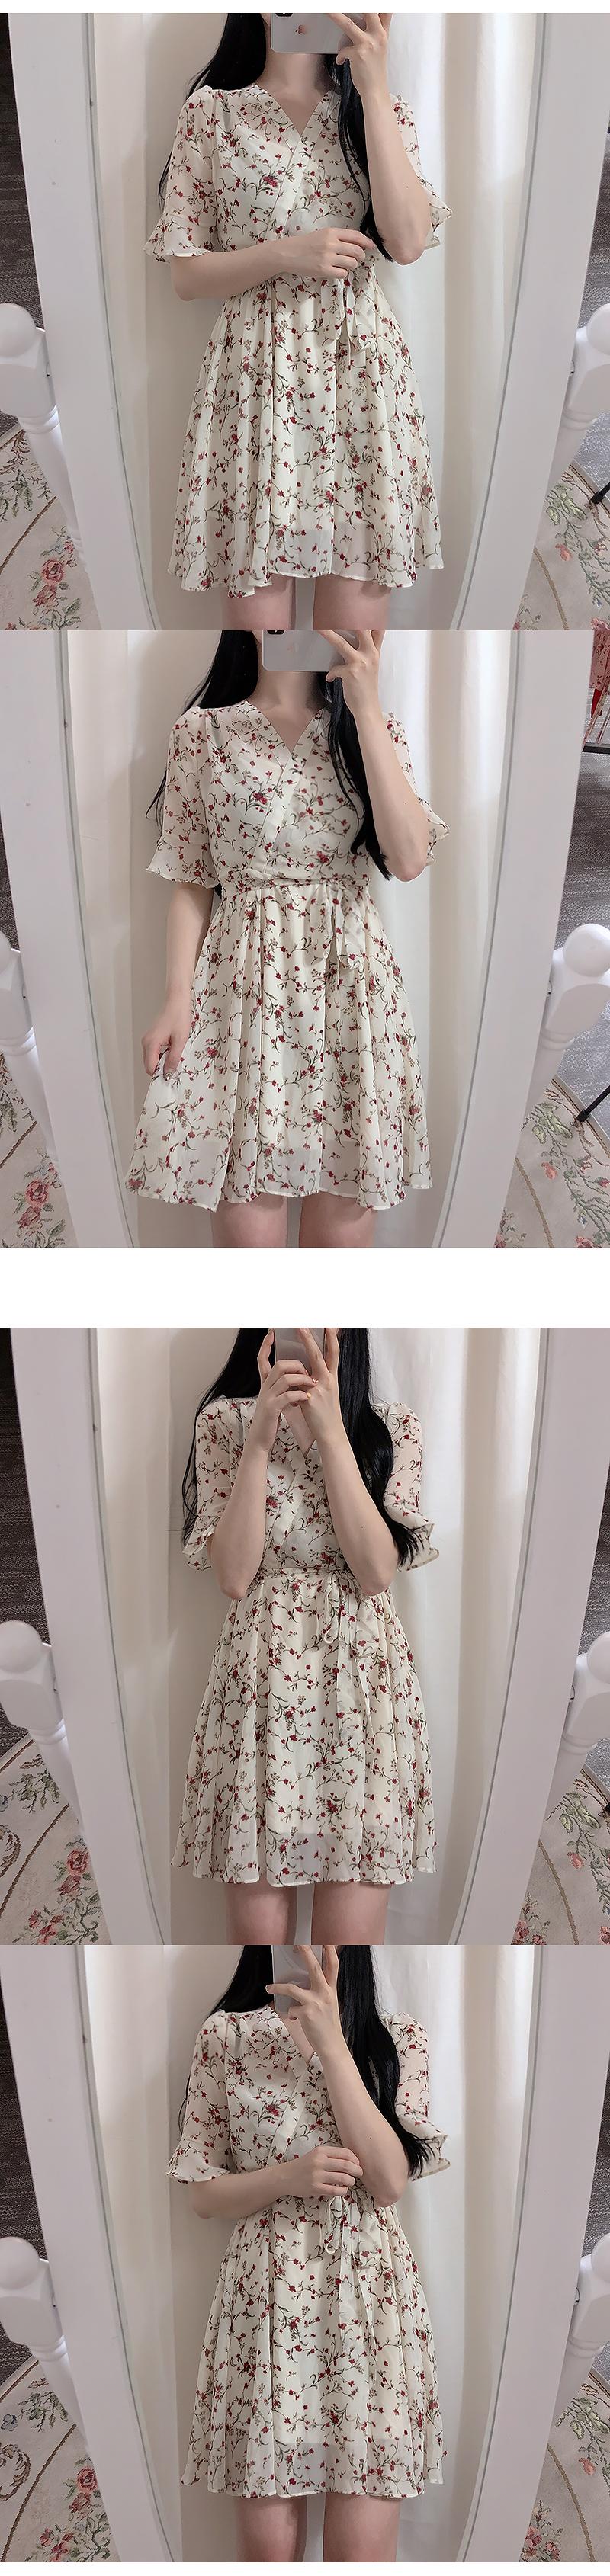 Daniel Chiffon Flower Dress